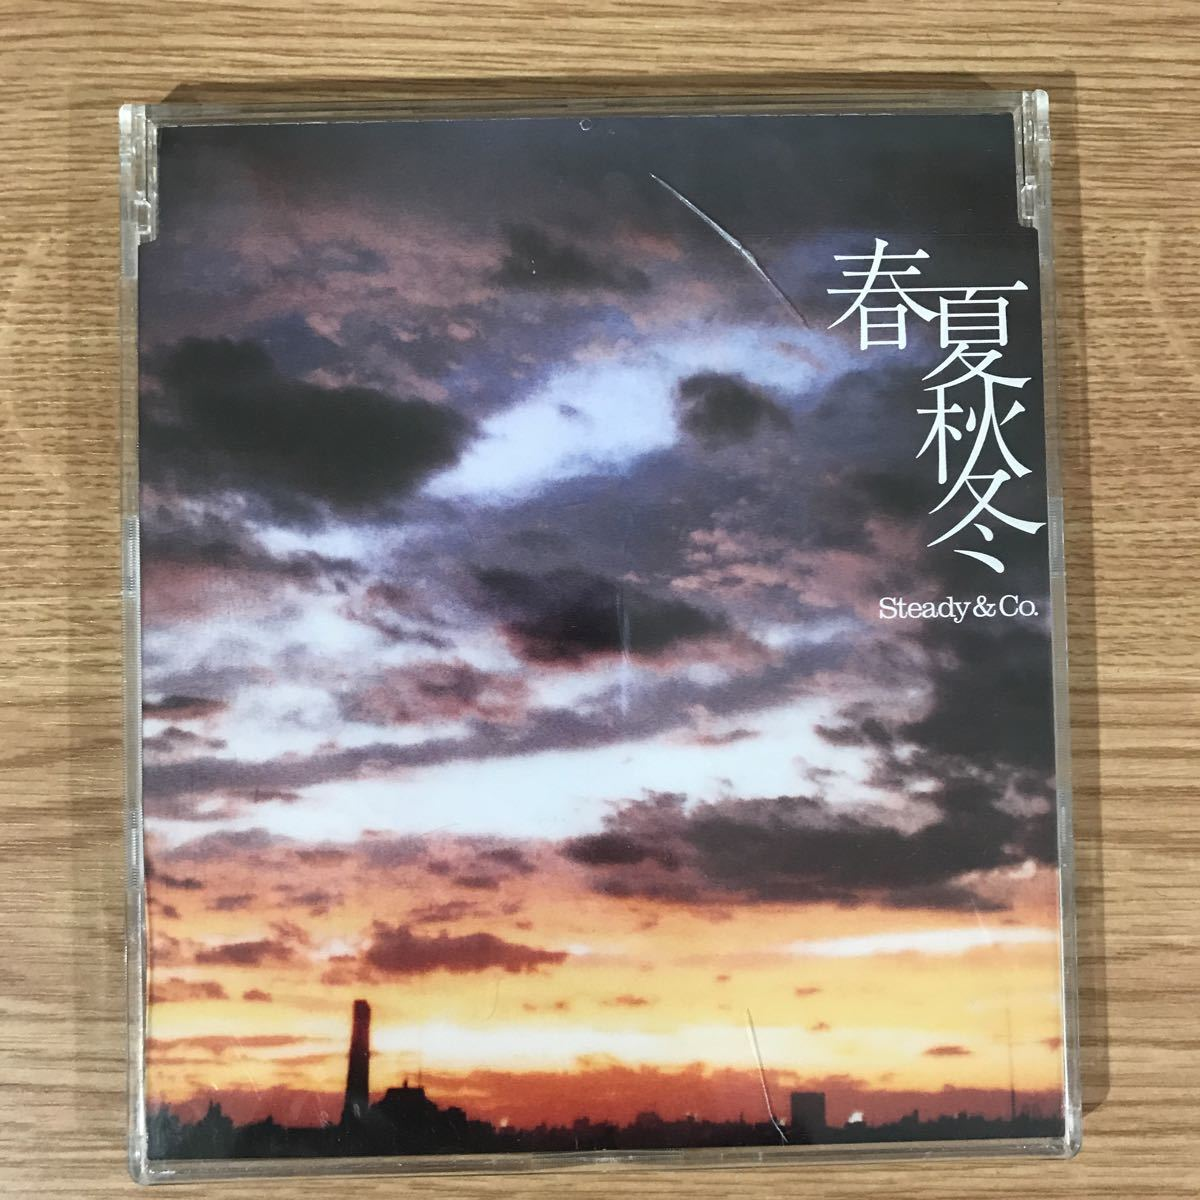 B16 中古CD100円 Steady & Co. 春夏秋冬_画像1